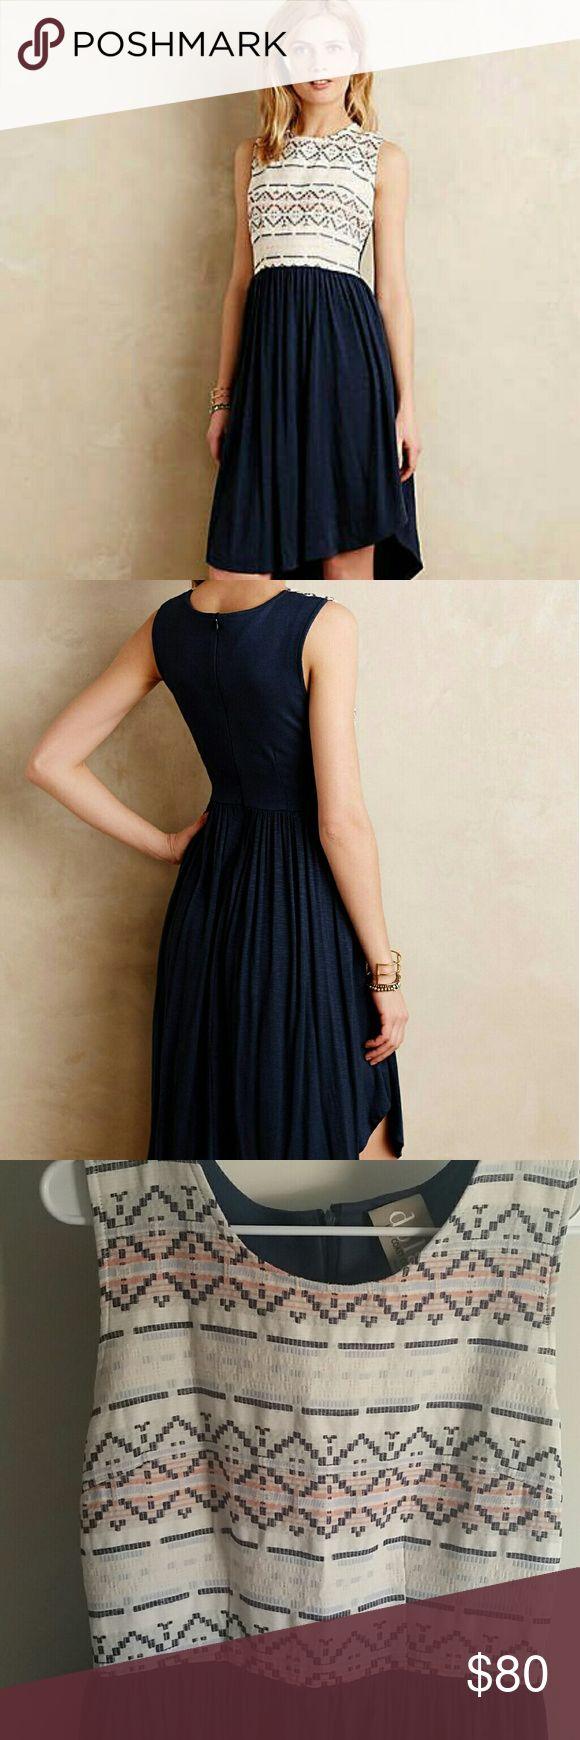 0c0a78b816cbe RARE Anthropologie M Dolan Left Coast Sabado dress This is a perfect summer  dress. Top